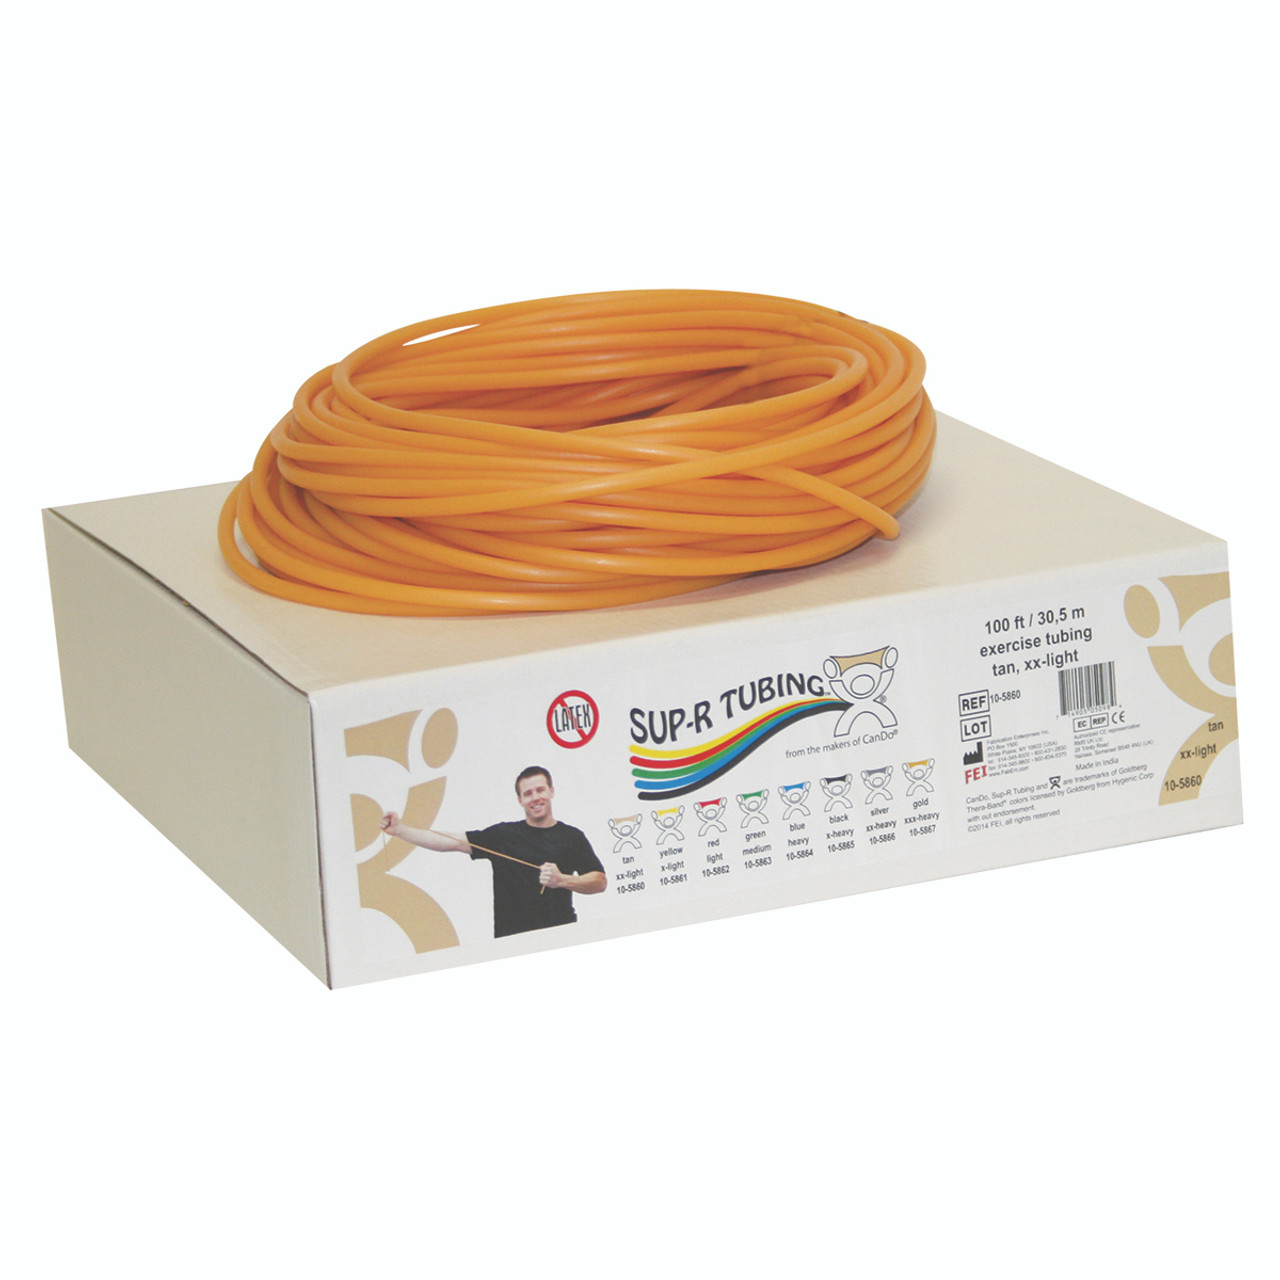 Sup-R Tubing¨ - Latex Free Exercise Tubing - 100' dispenser roll - Tan - xx-light